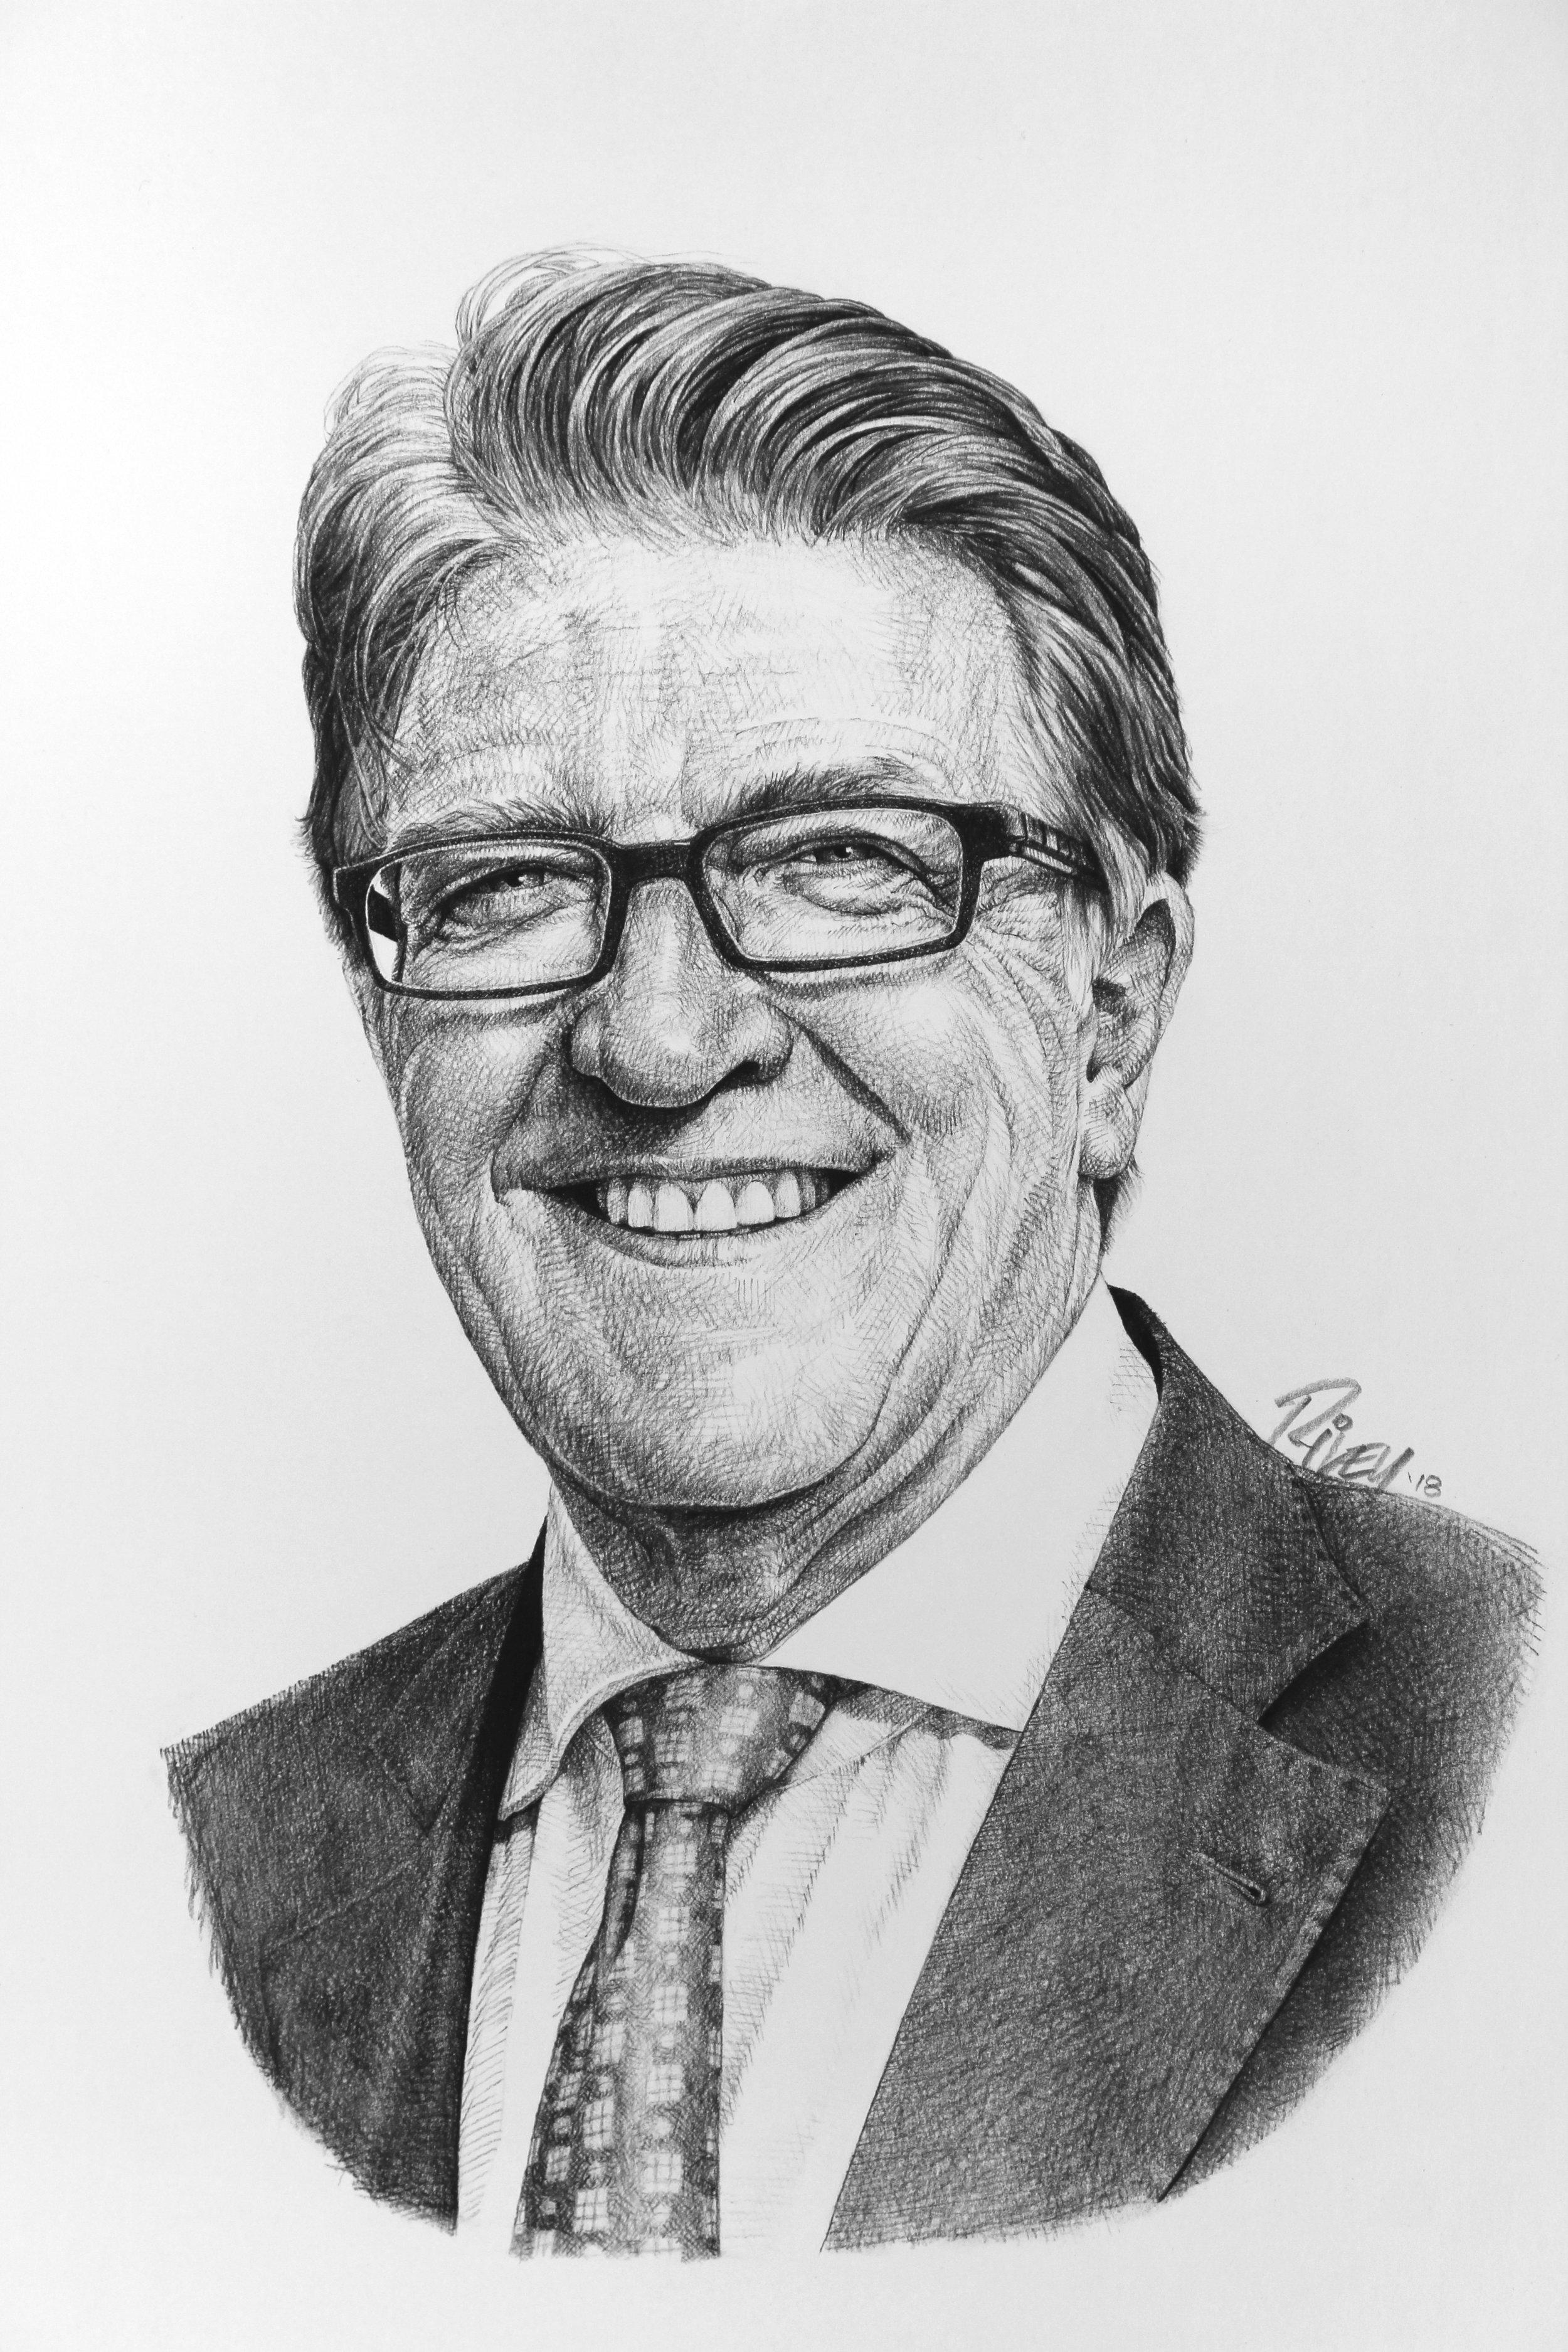 Robert J. Deluce